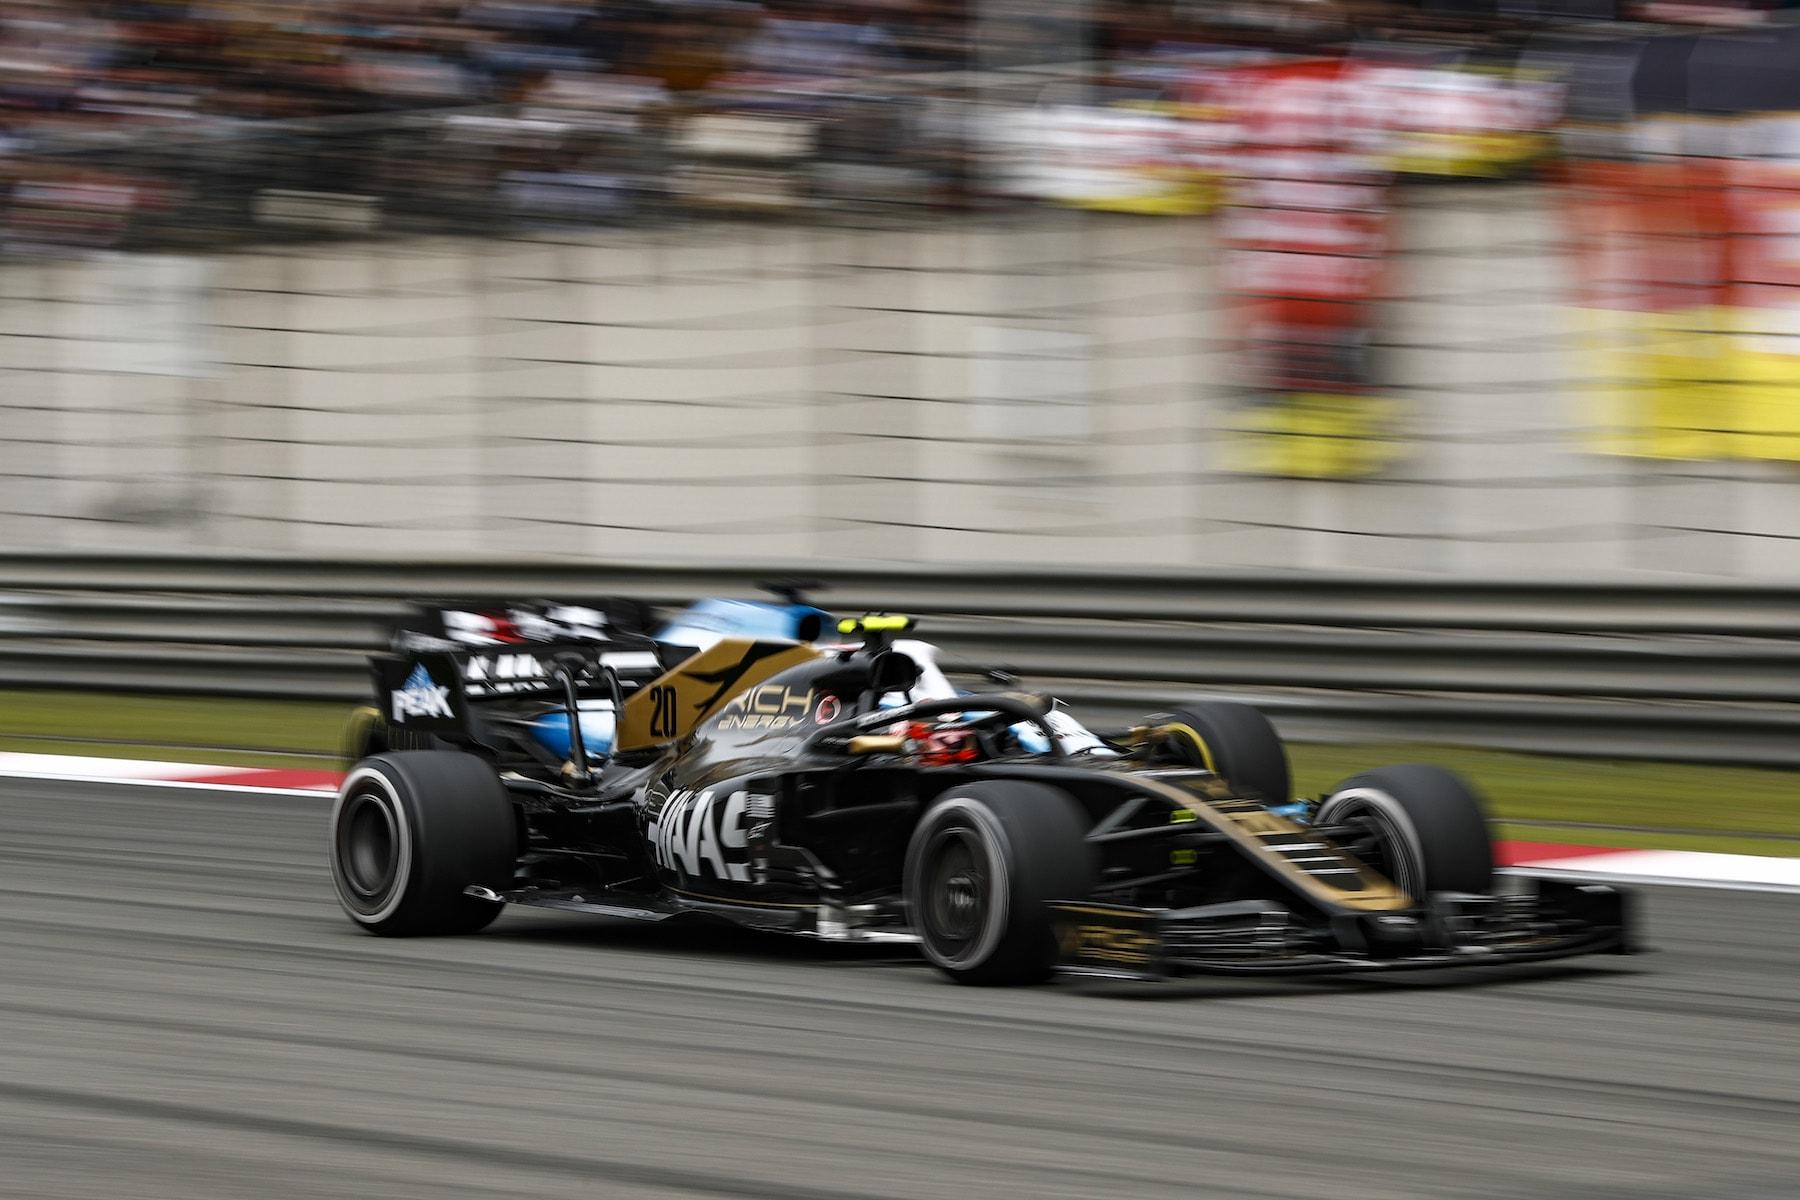 3 2019 Kevin Magnussen | Haas VF19 | 2019 Chinese GP 1 copy.jpg